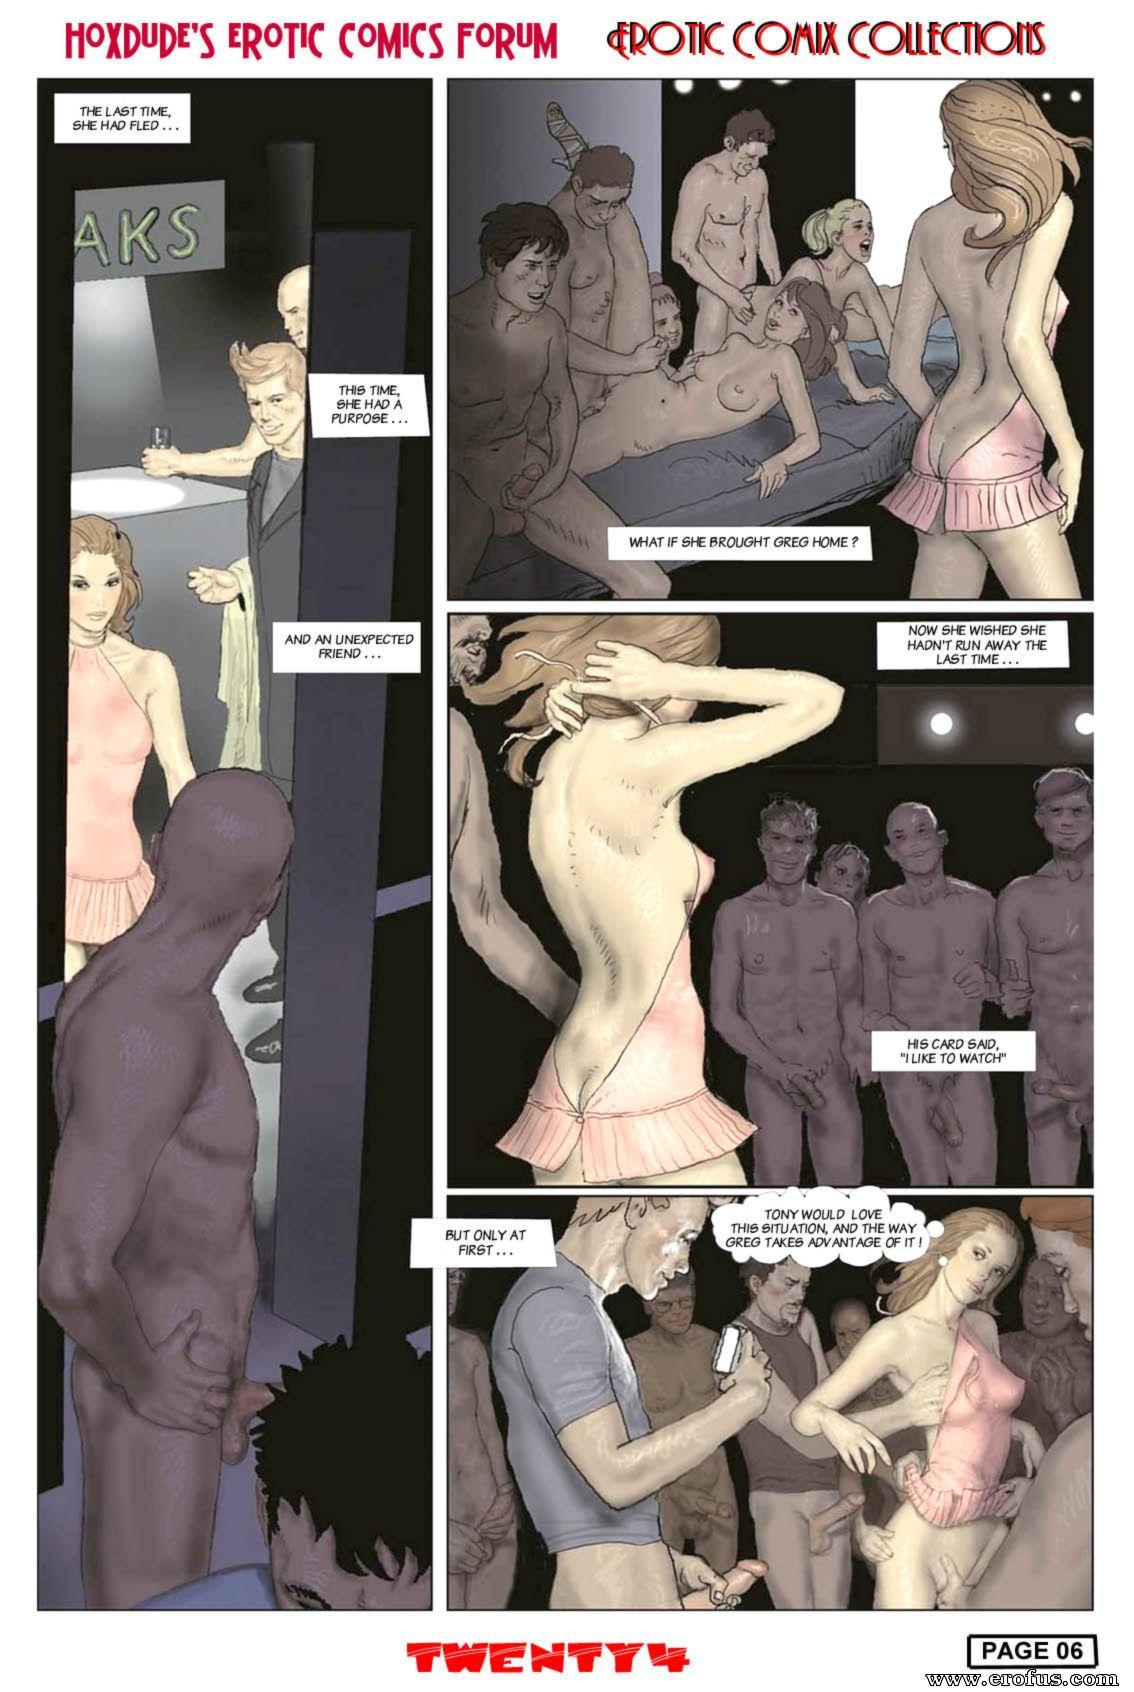 twenty-erotic-comic-bad-girl-naked-movie